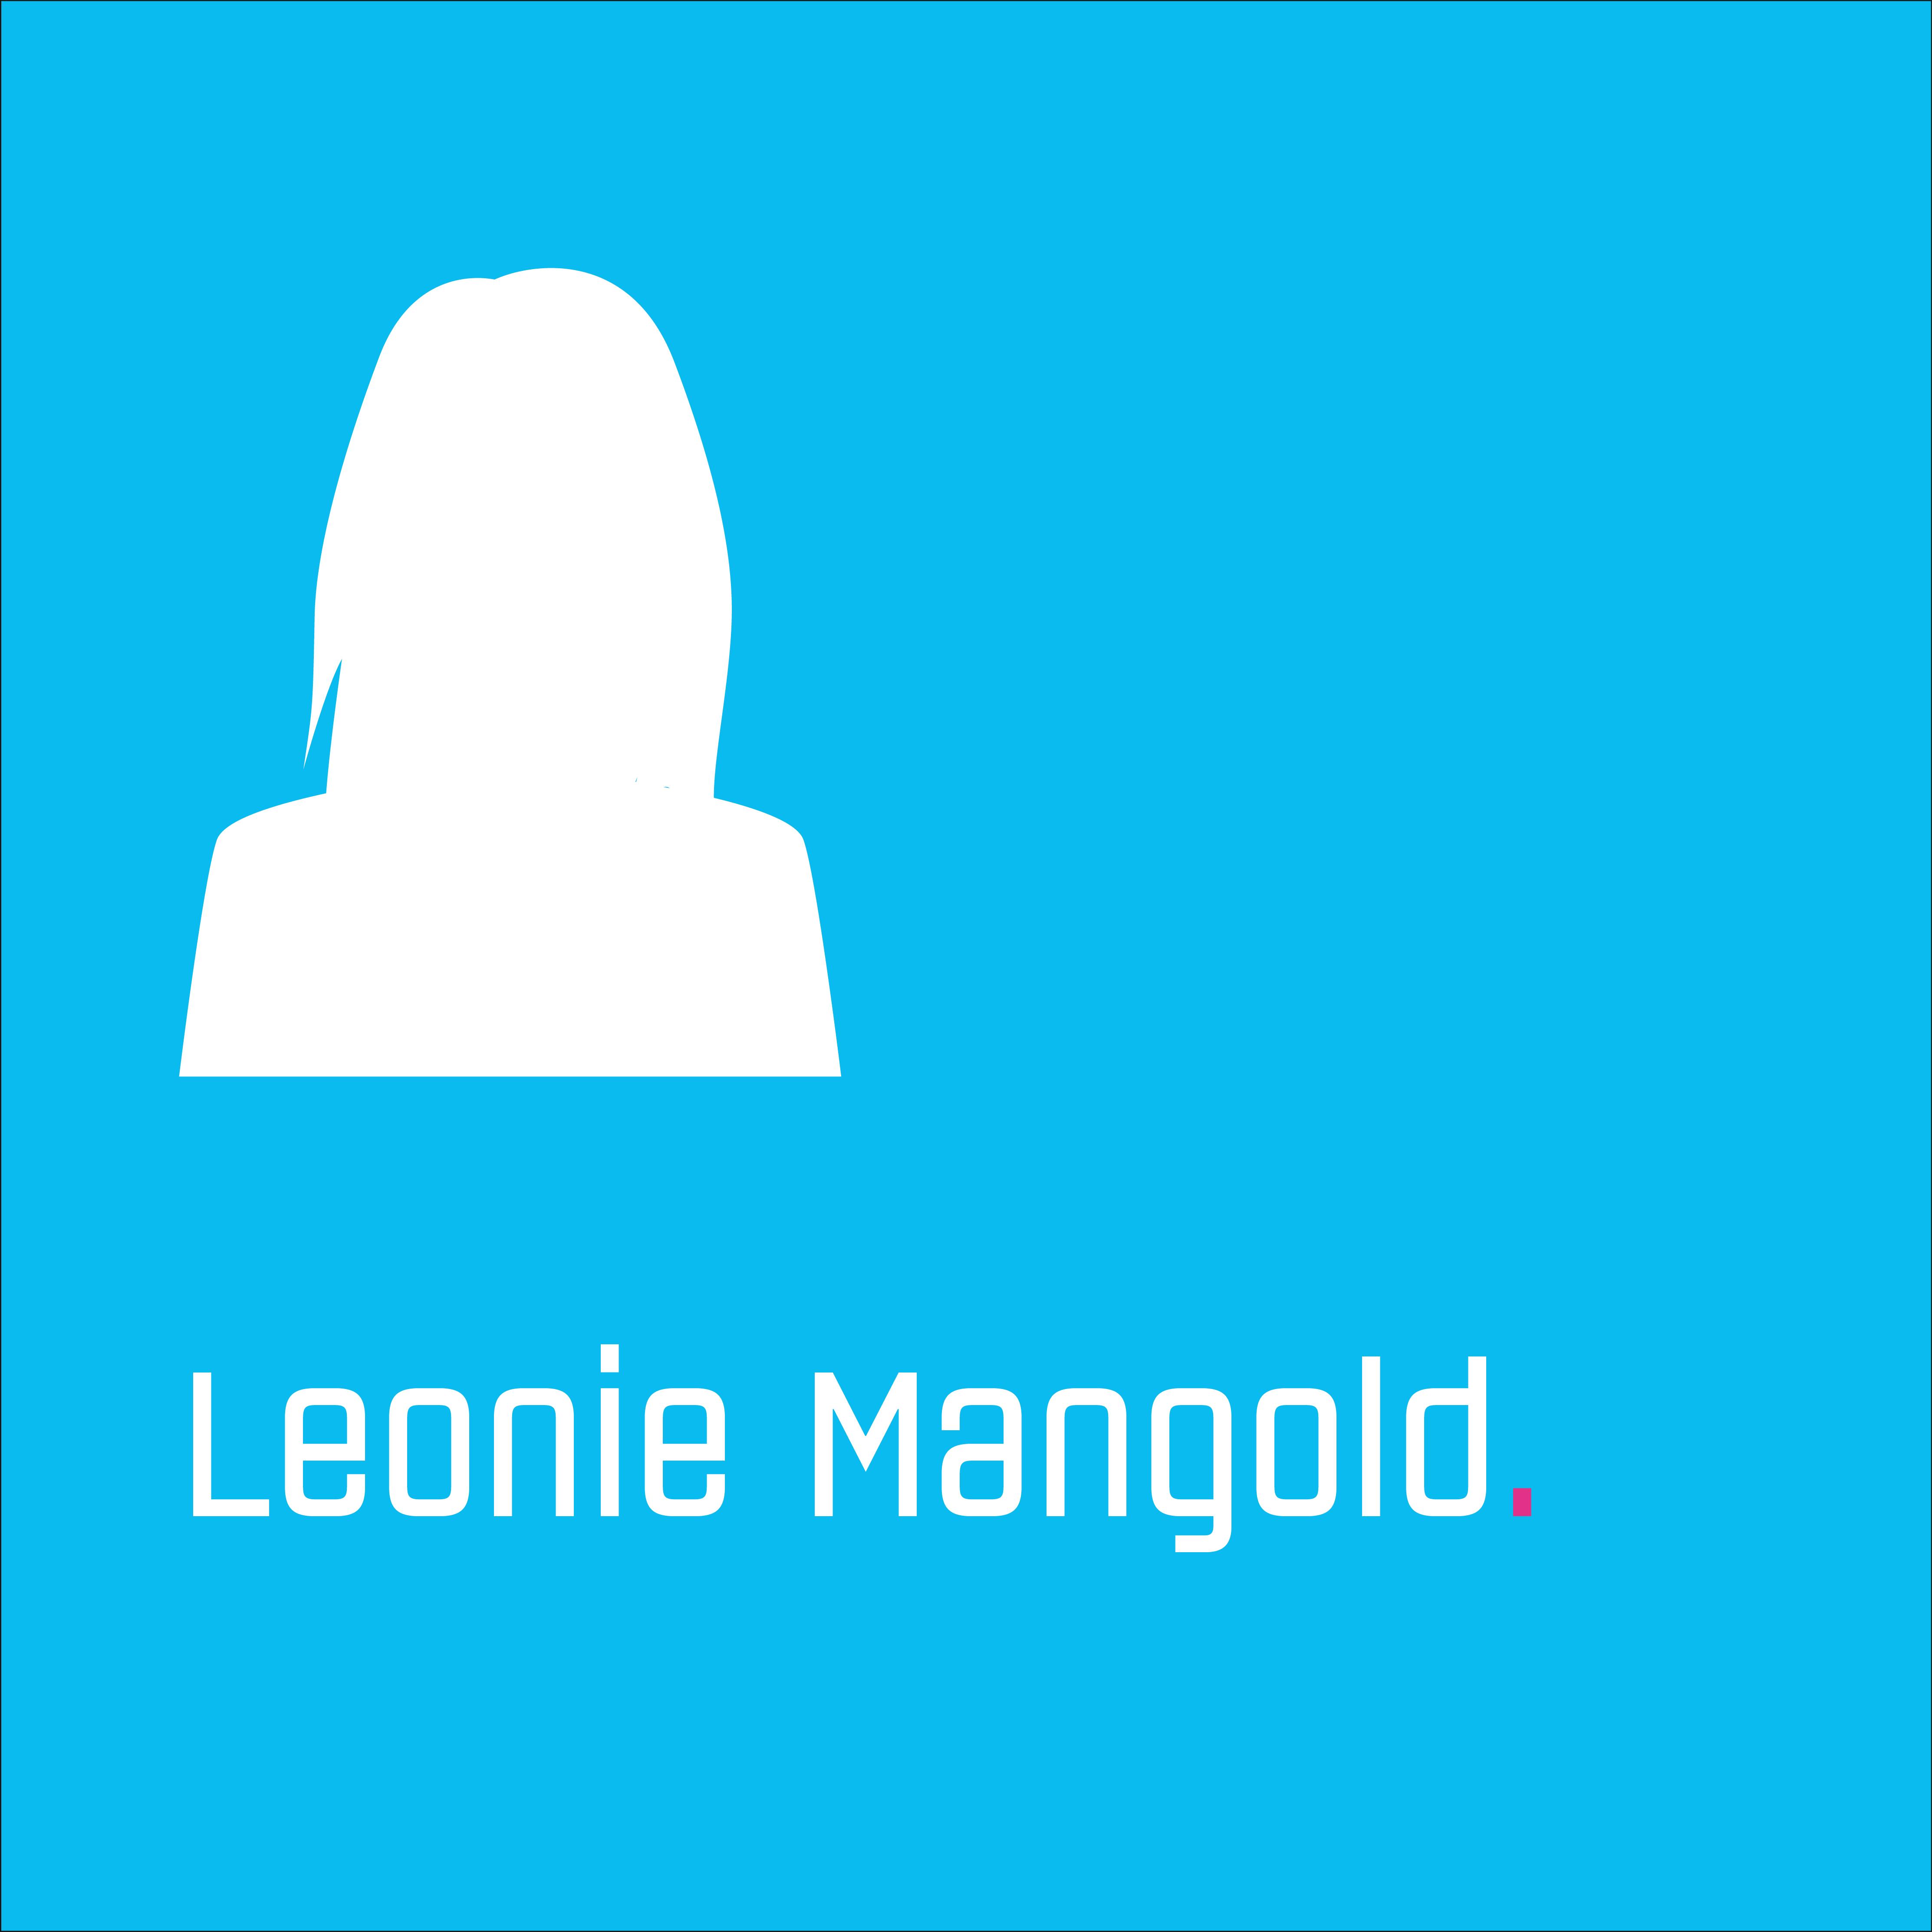 LEONIE MANGOLD